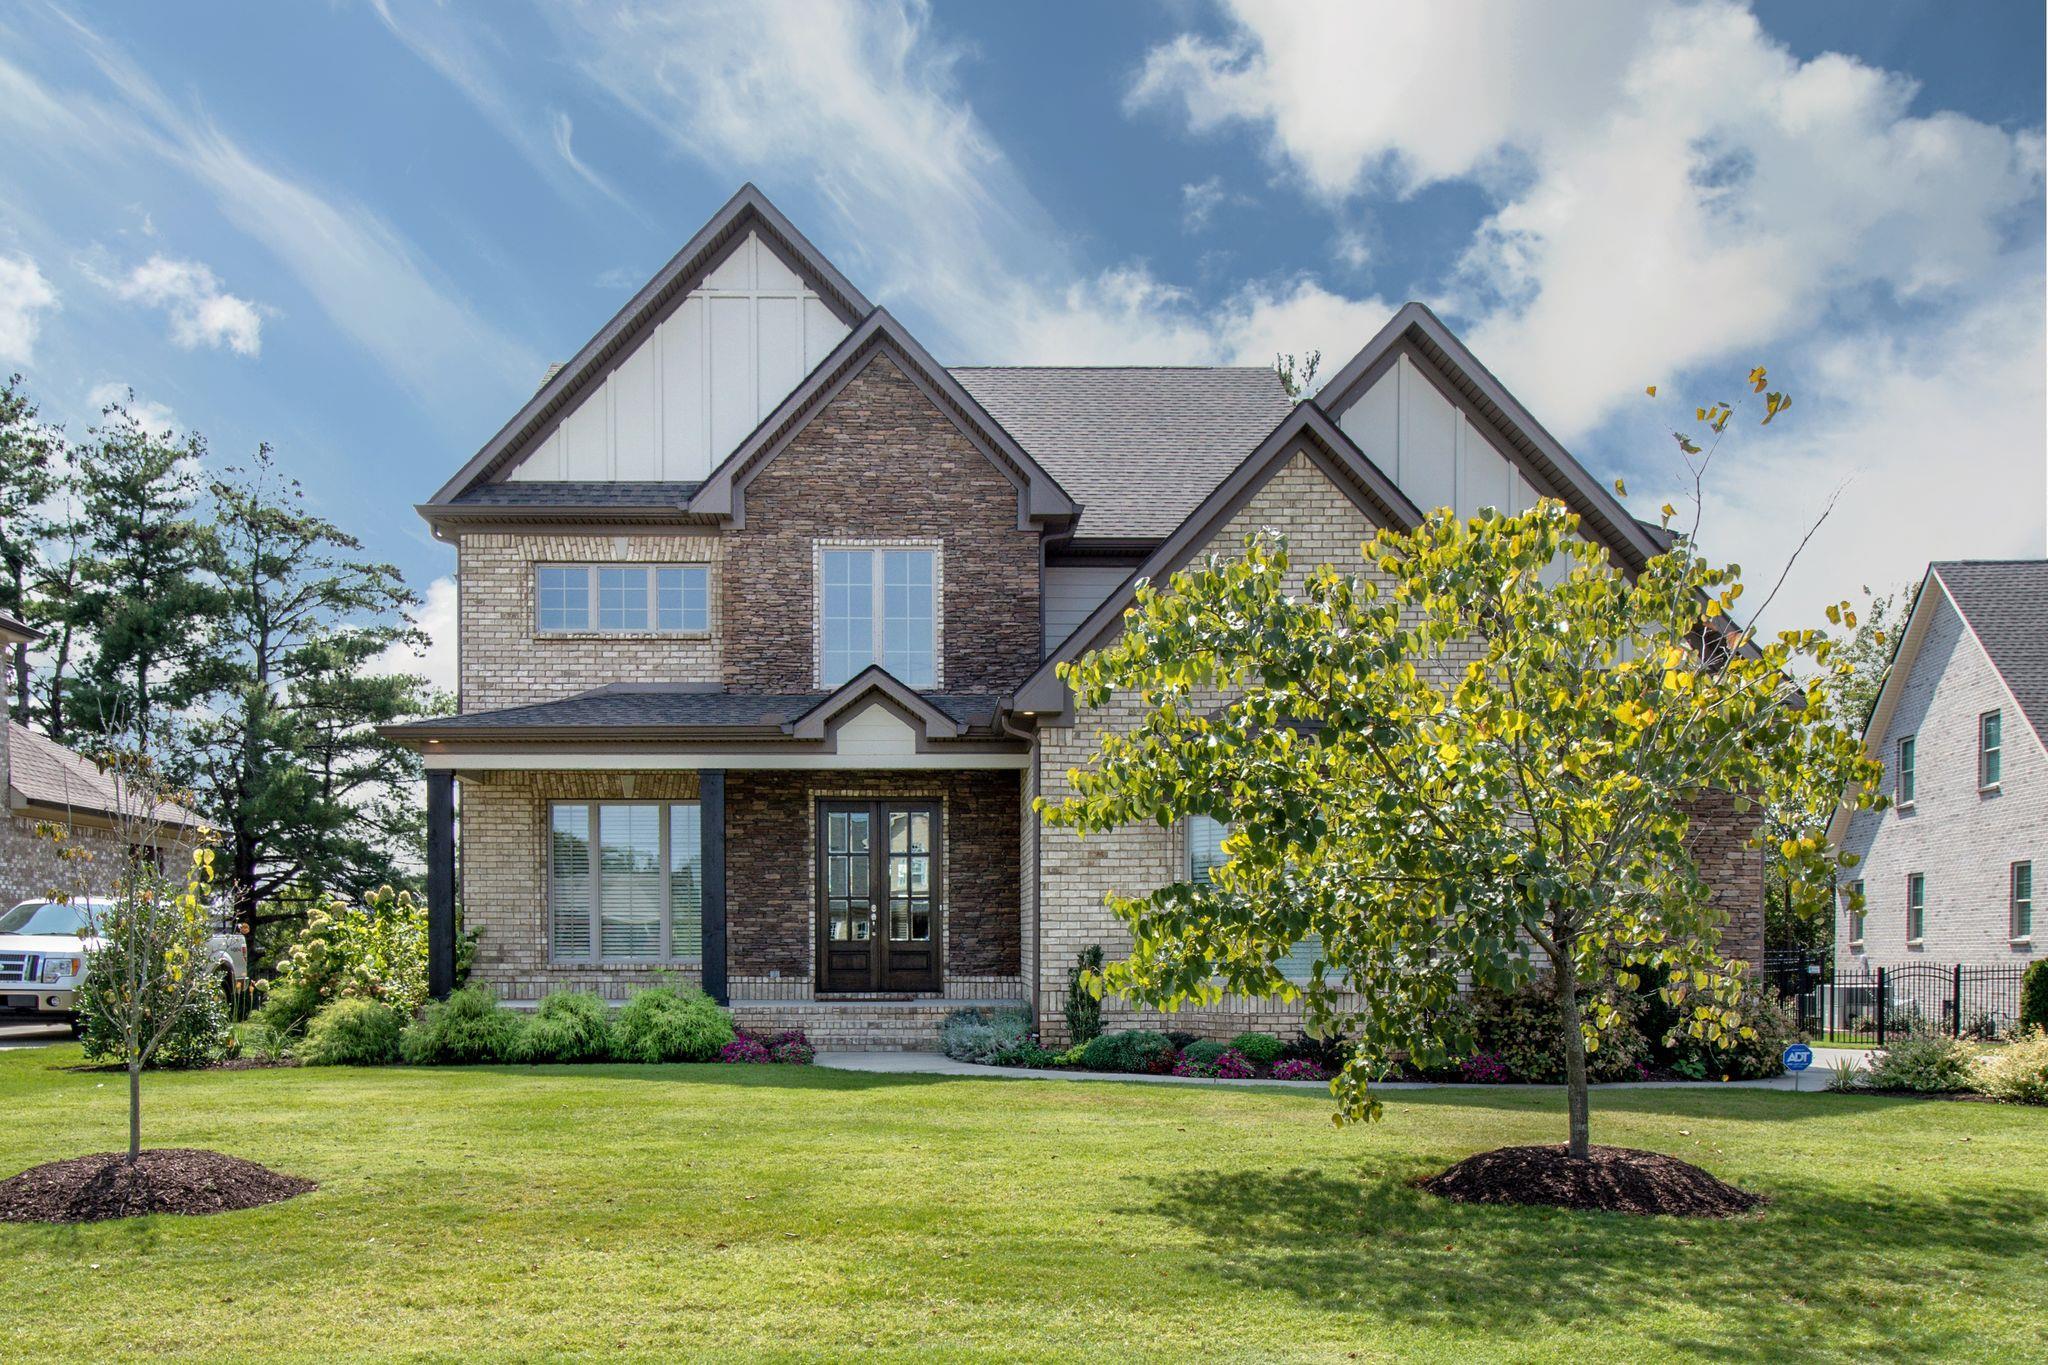 1714 McKinley, Murfreesboro, TN 37130 - Murfreesboro, TN real estate listing